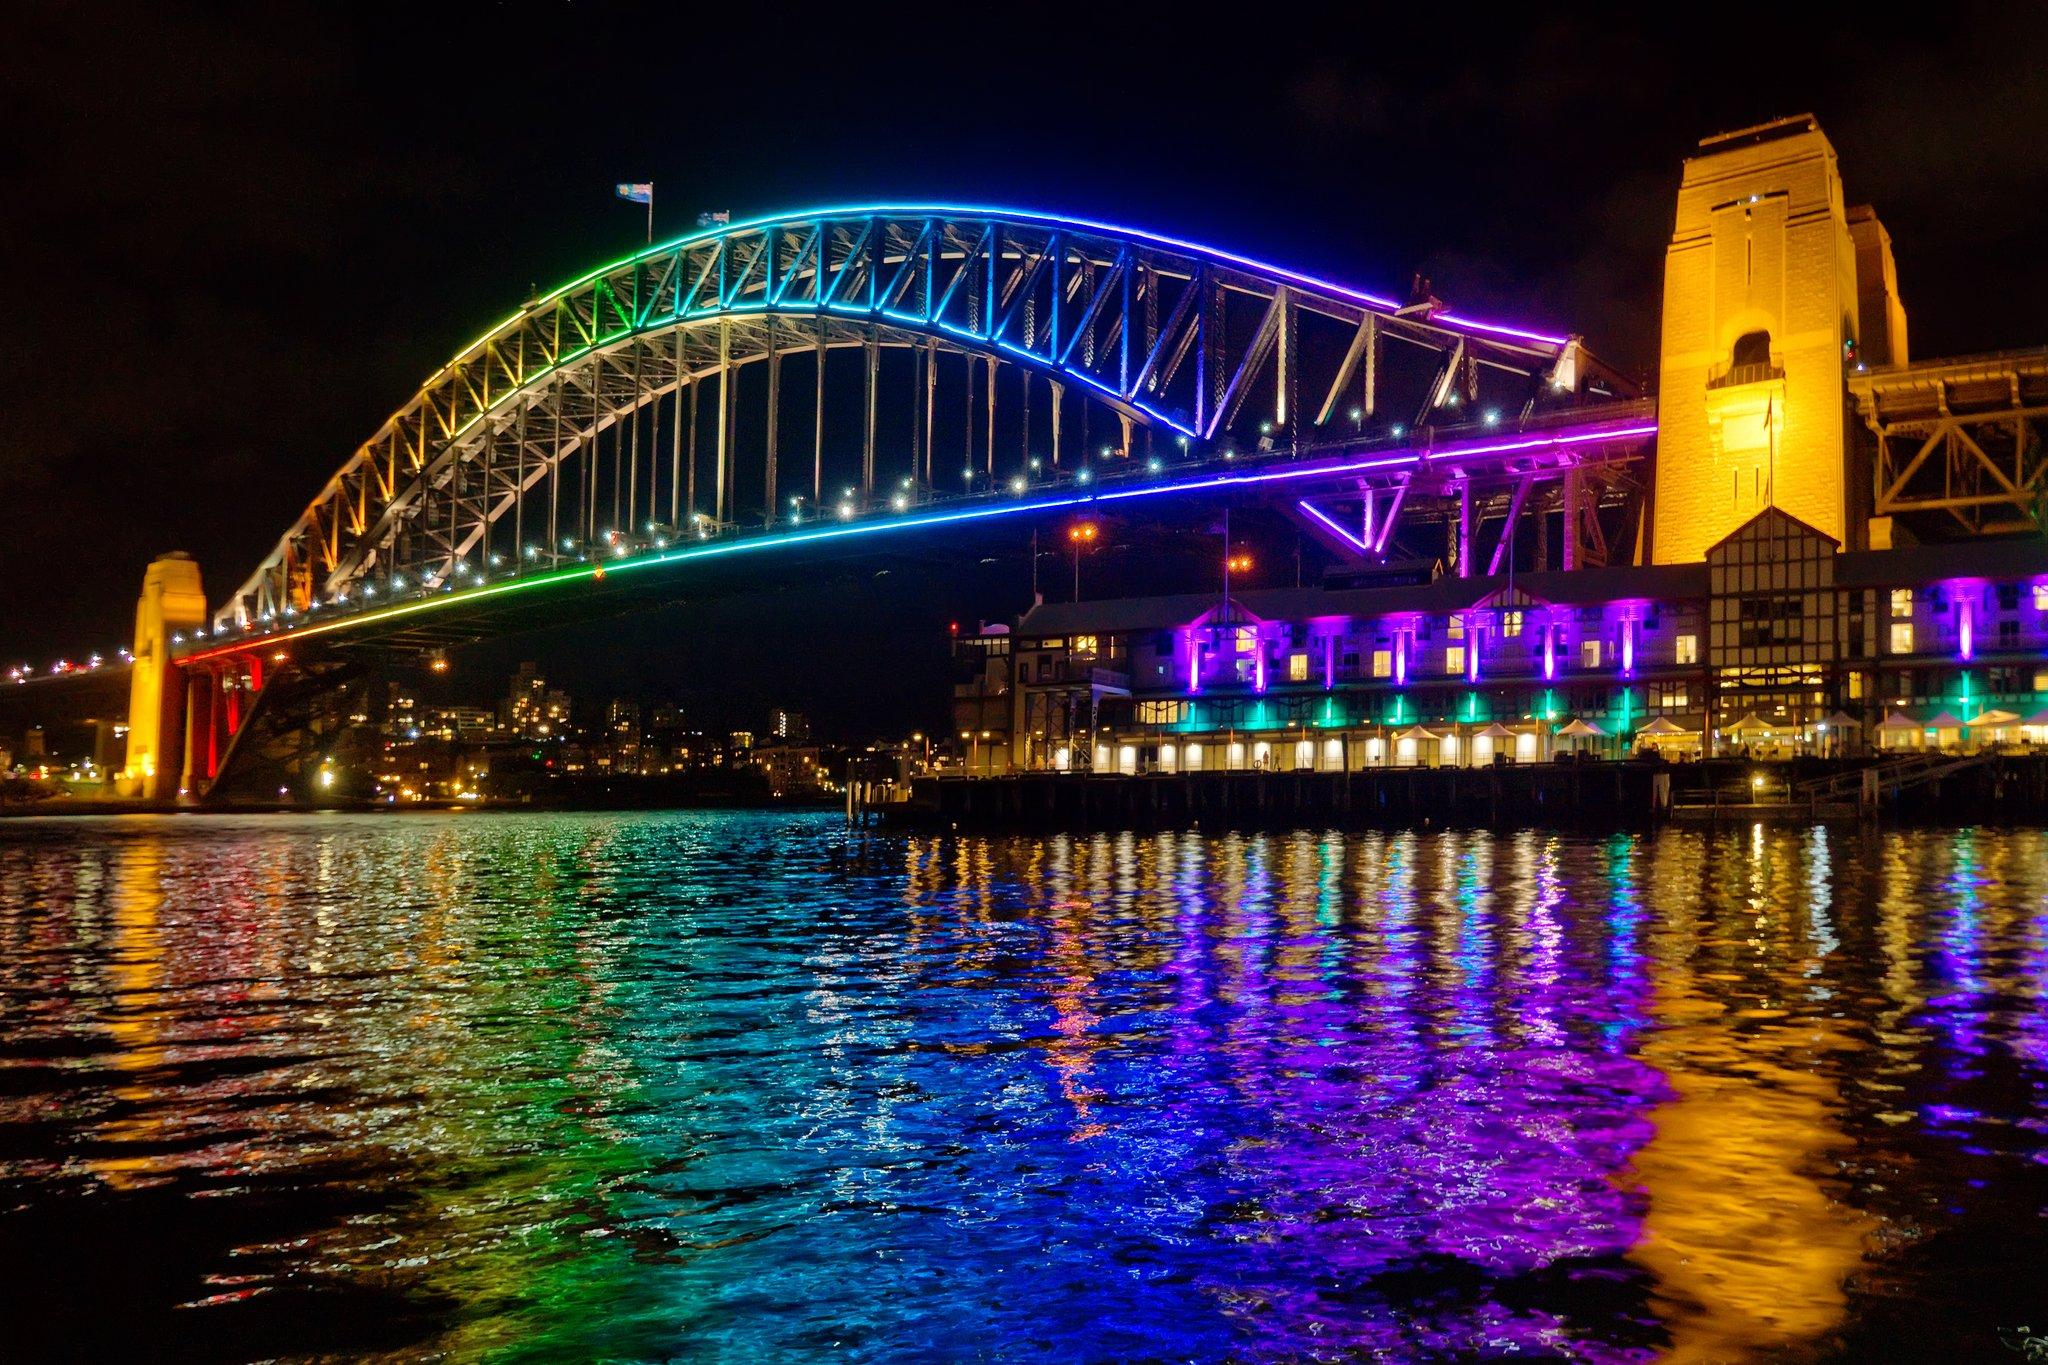 建立同志社群的溝通與交流<br>Building bridges to the LGBTIQ community